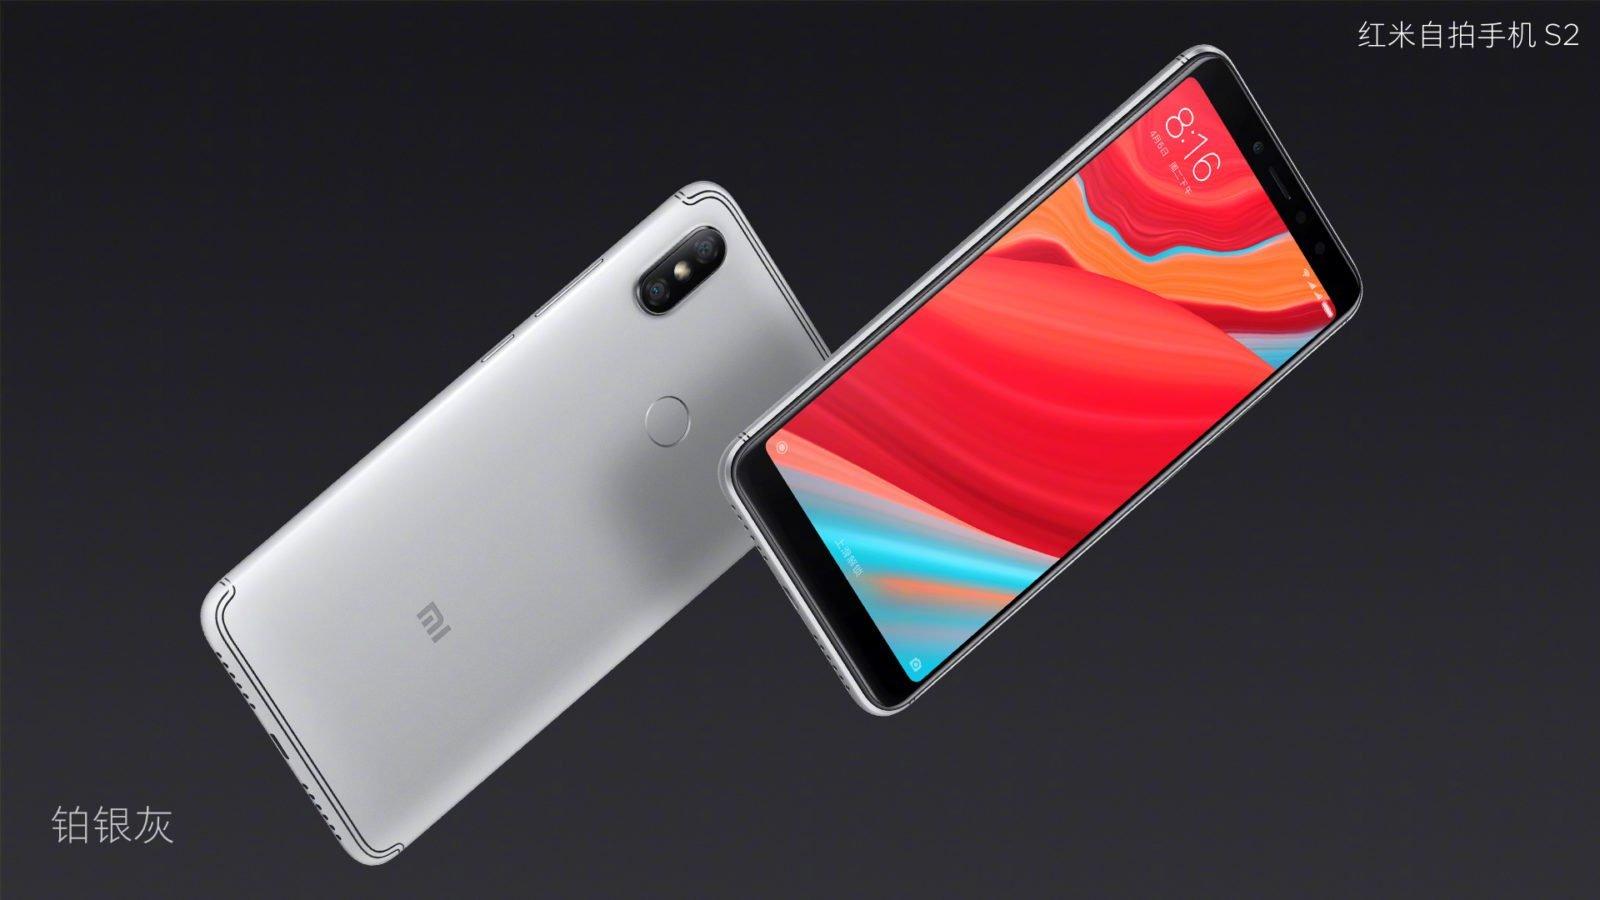 Xiaomi Redmi S2 official image 9 1600x900